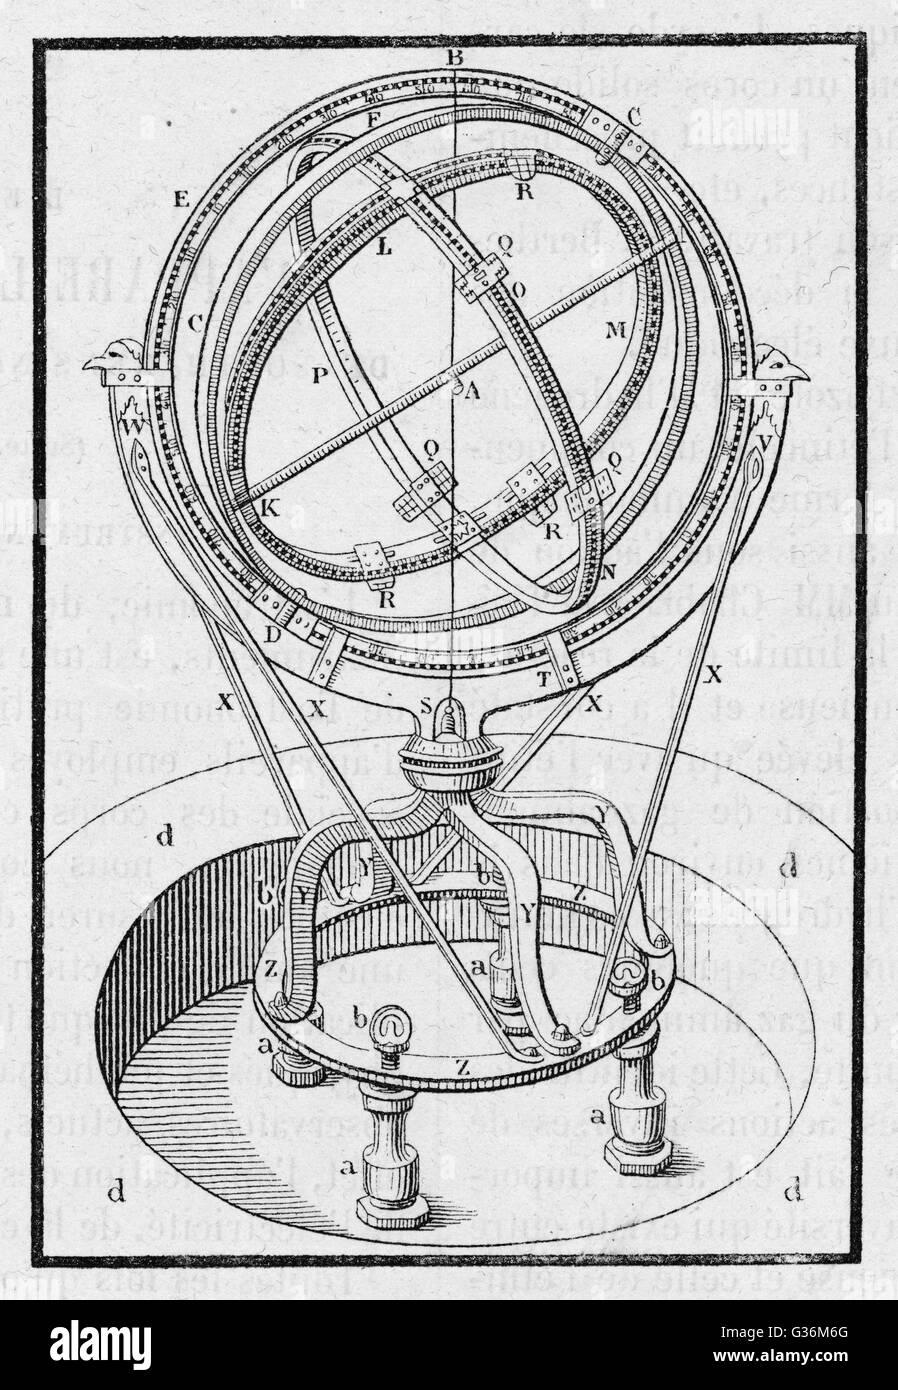 Astrolabe of Tycho Brahe - Stock Image